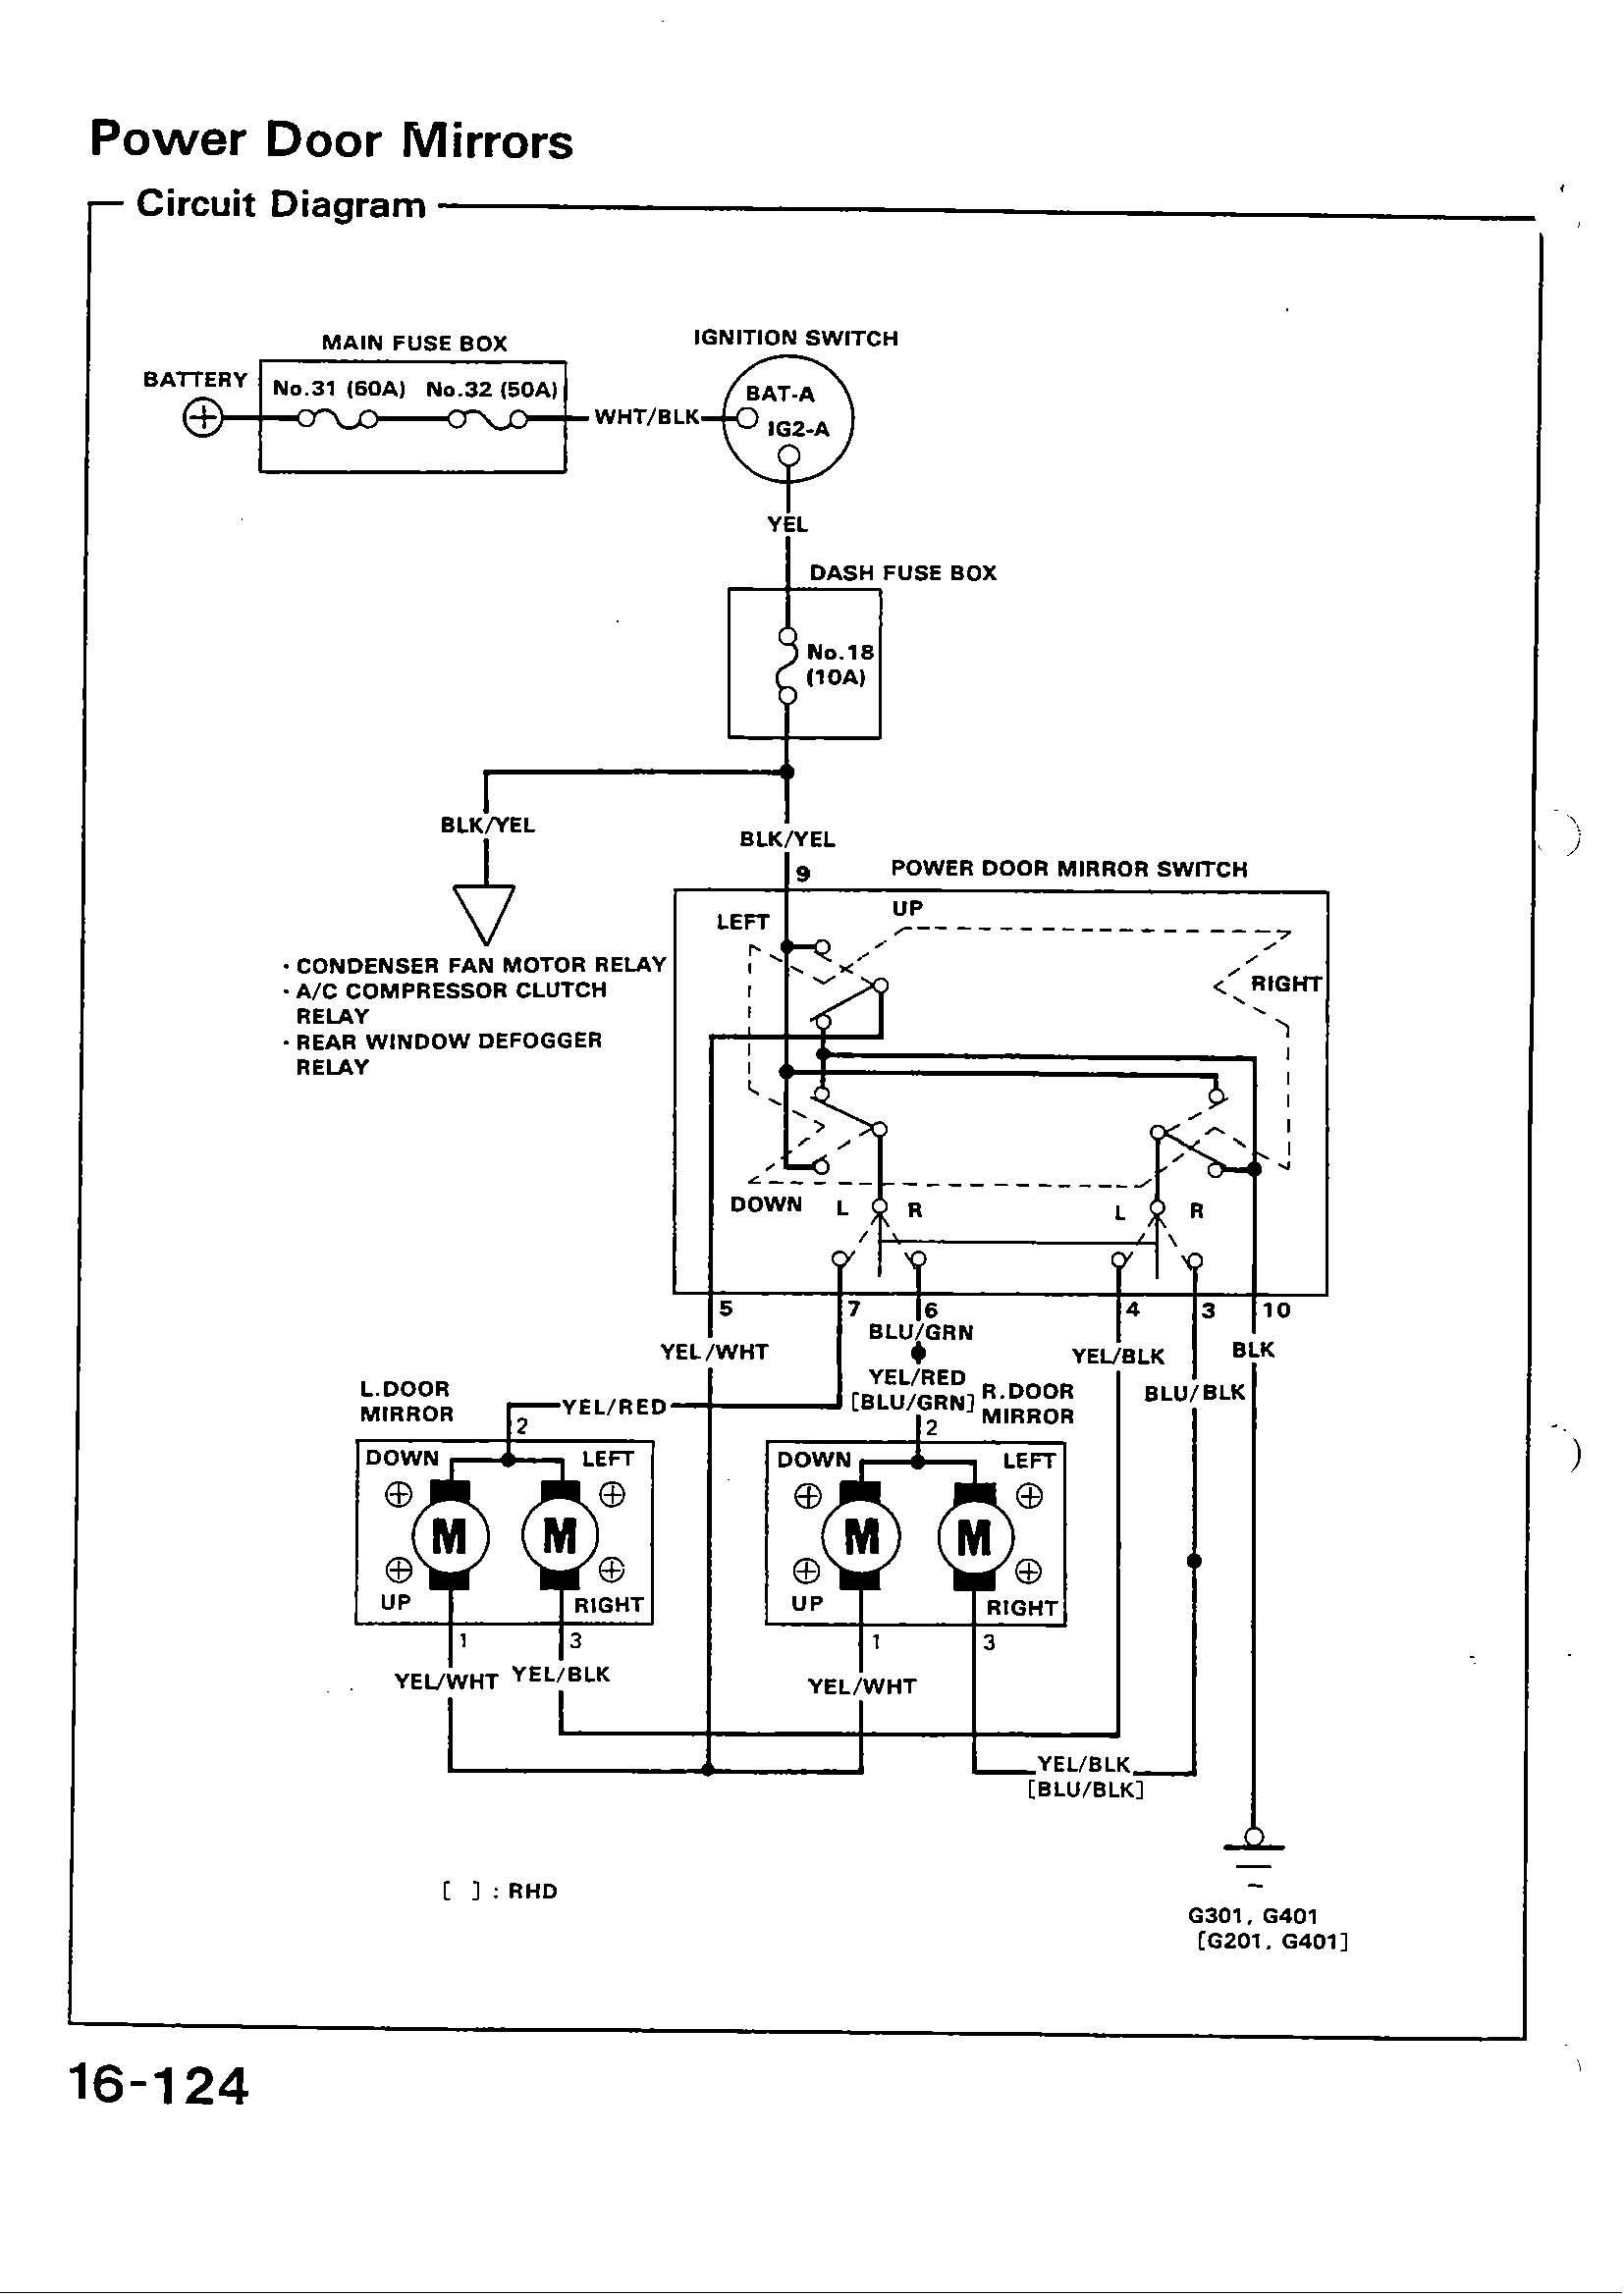 Fan Relay Wiring Diagram Honda Download Diagrams Hvac 91 Crx Dx W B16 Radiator Electric